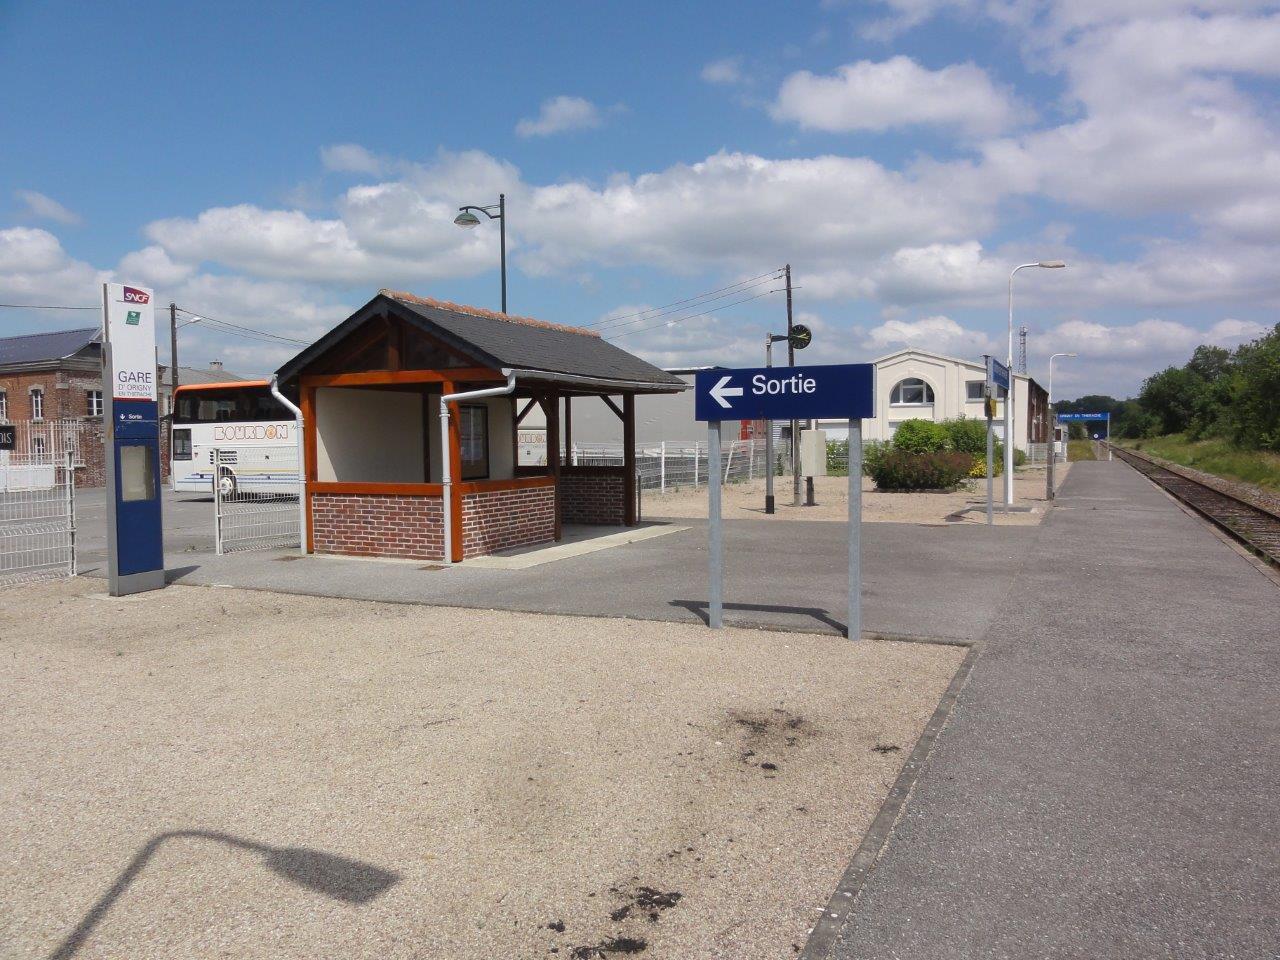 gare-d-origny-en-thierache-train-station